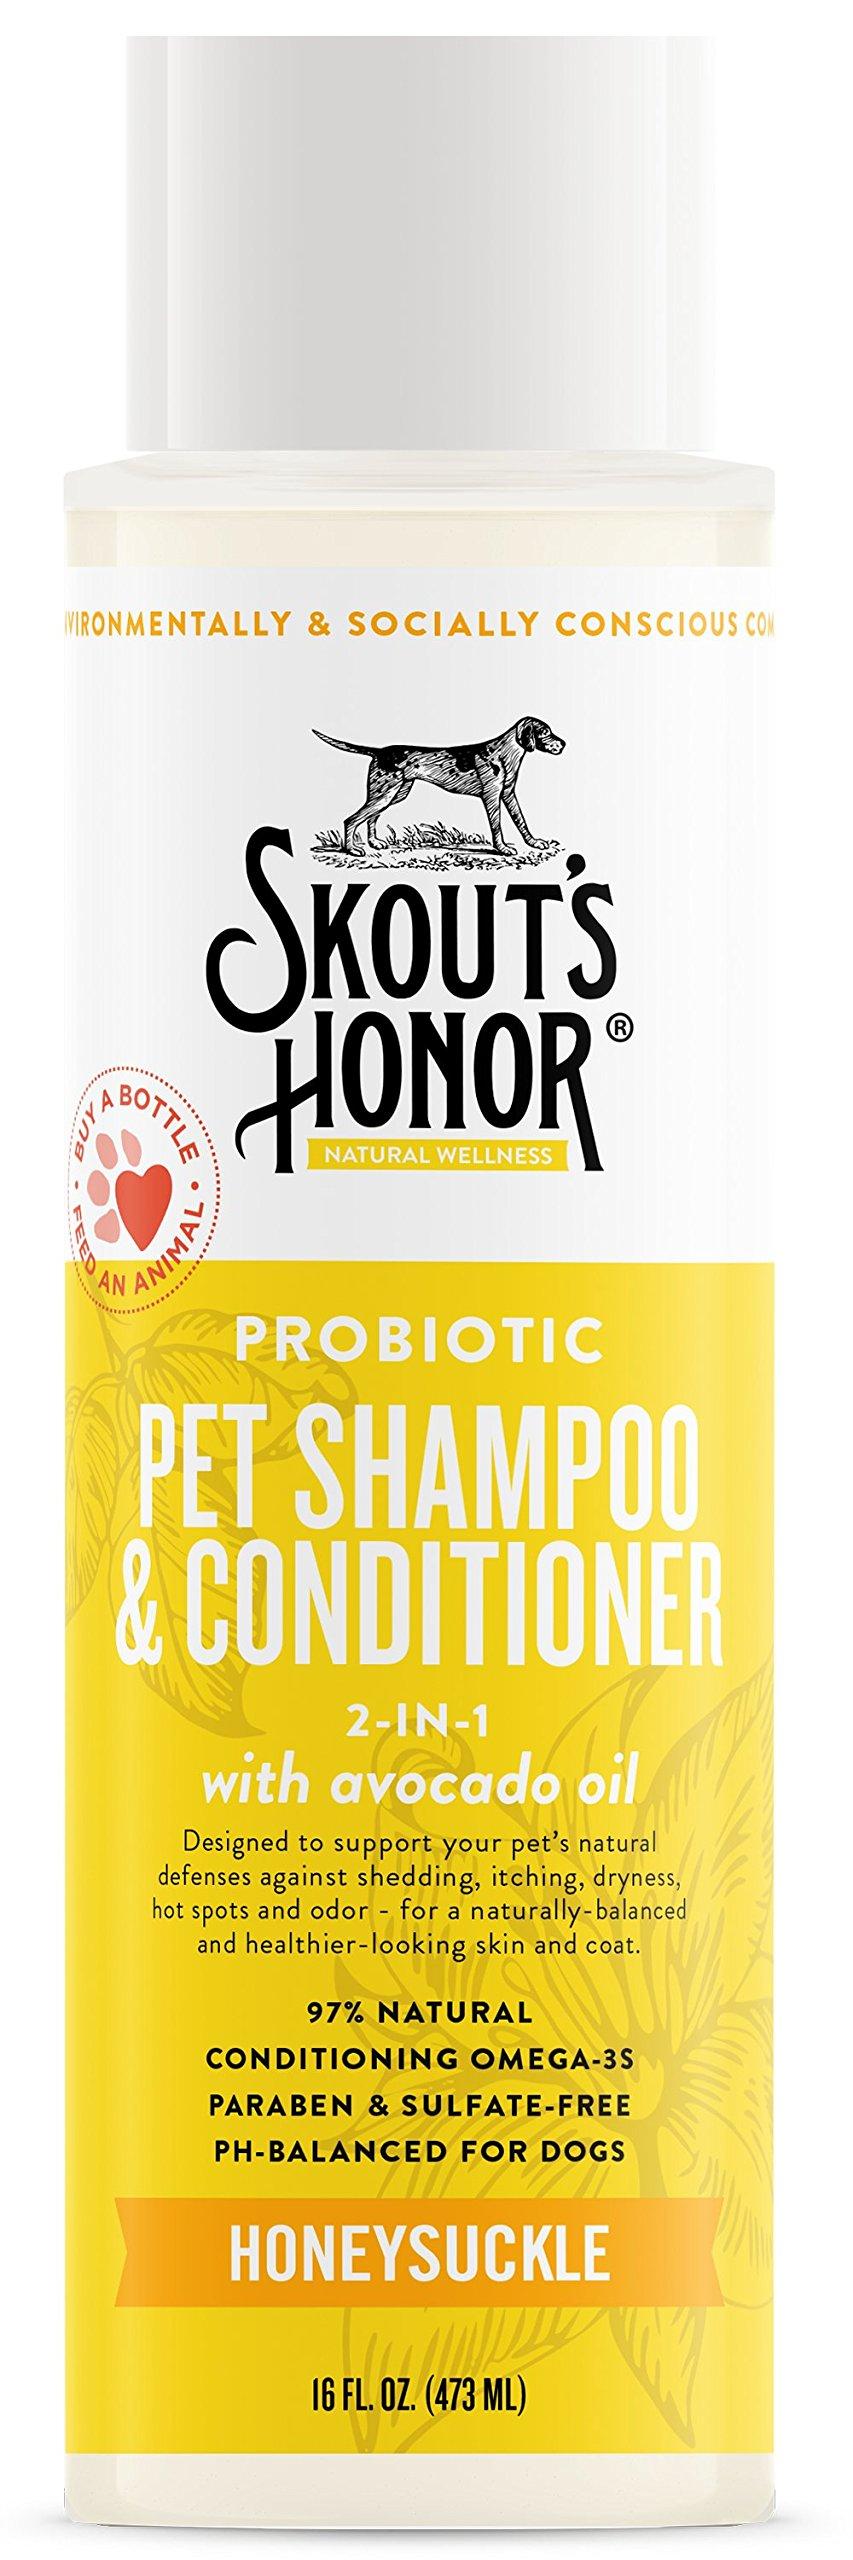 SKOUT'S HONOR Probiotic Pet Shampoo & Conditioner (2-in-1) - 16 fl. oz.